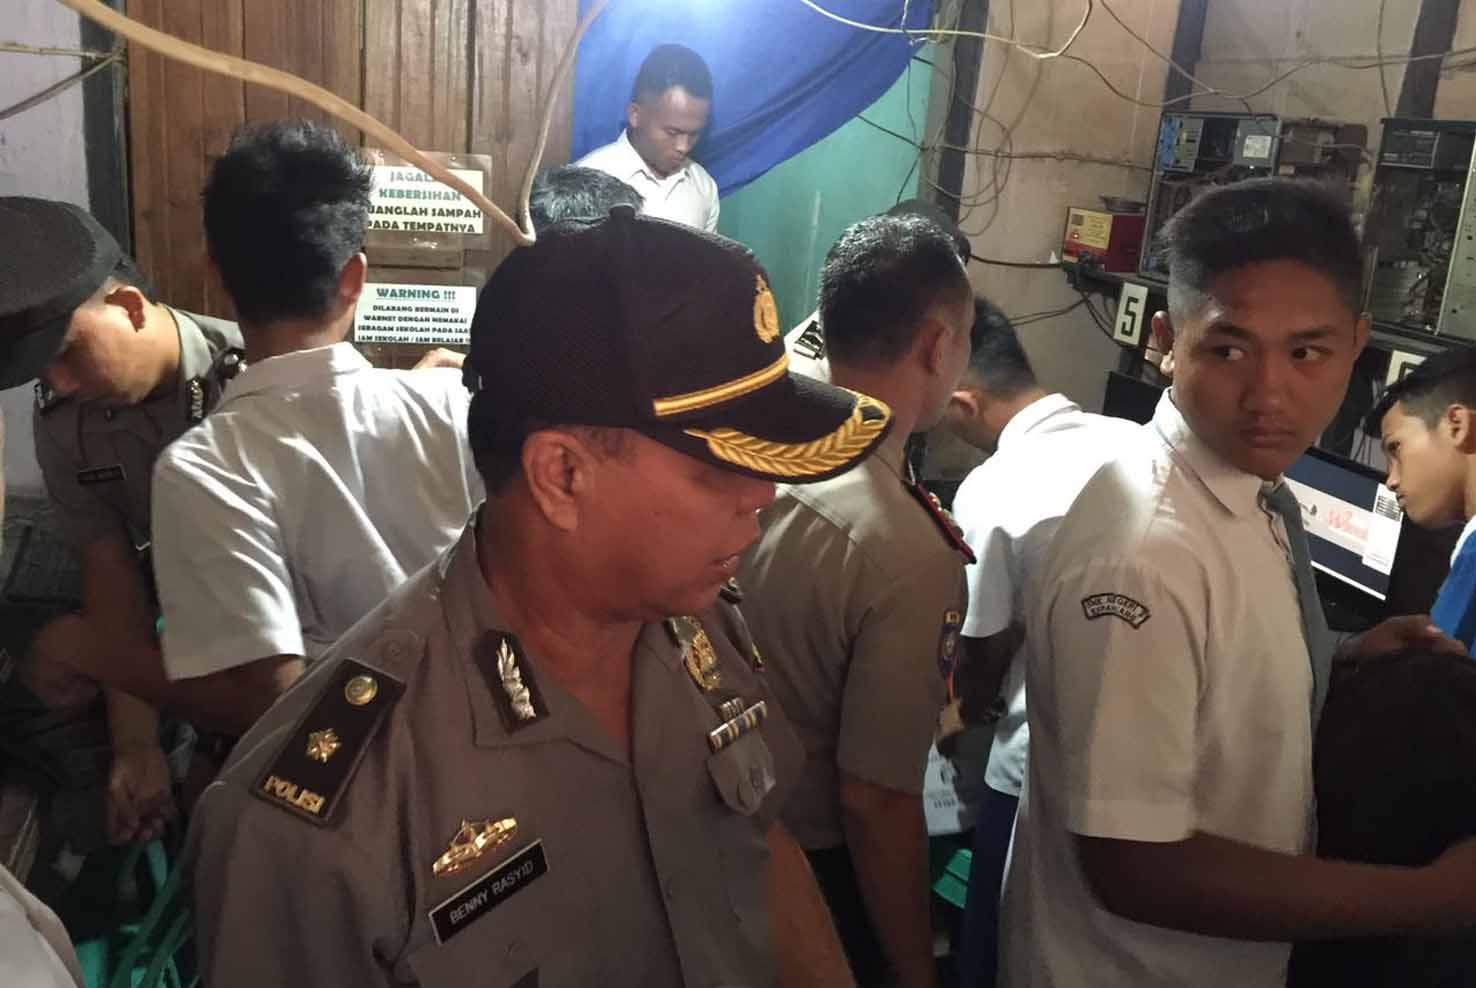 9 Pelajar Diamankan Polisi, Tertangkap Tangan Saat Jam Sekolah Nongkrong di Warnet